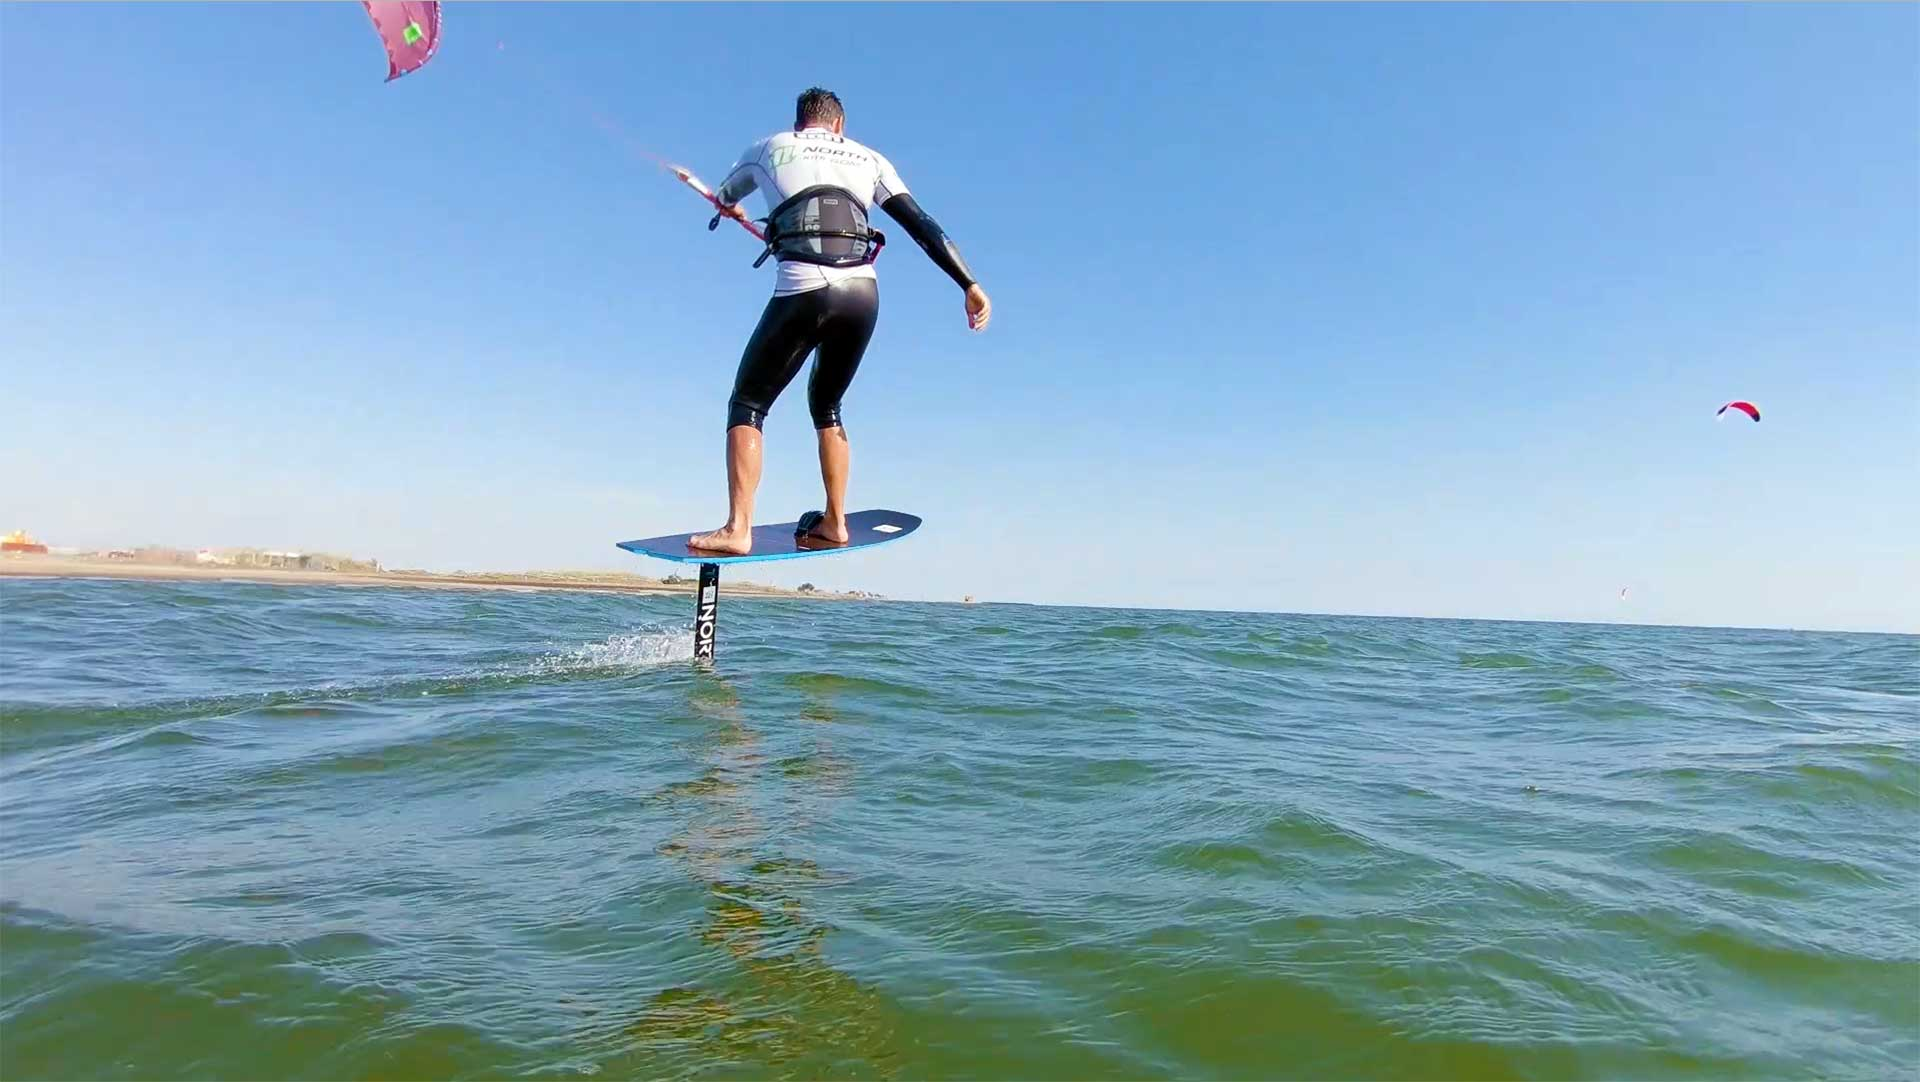 kite surf foil session